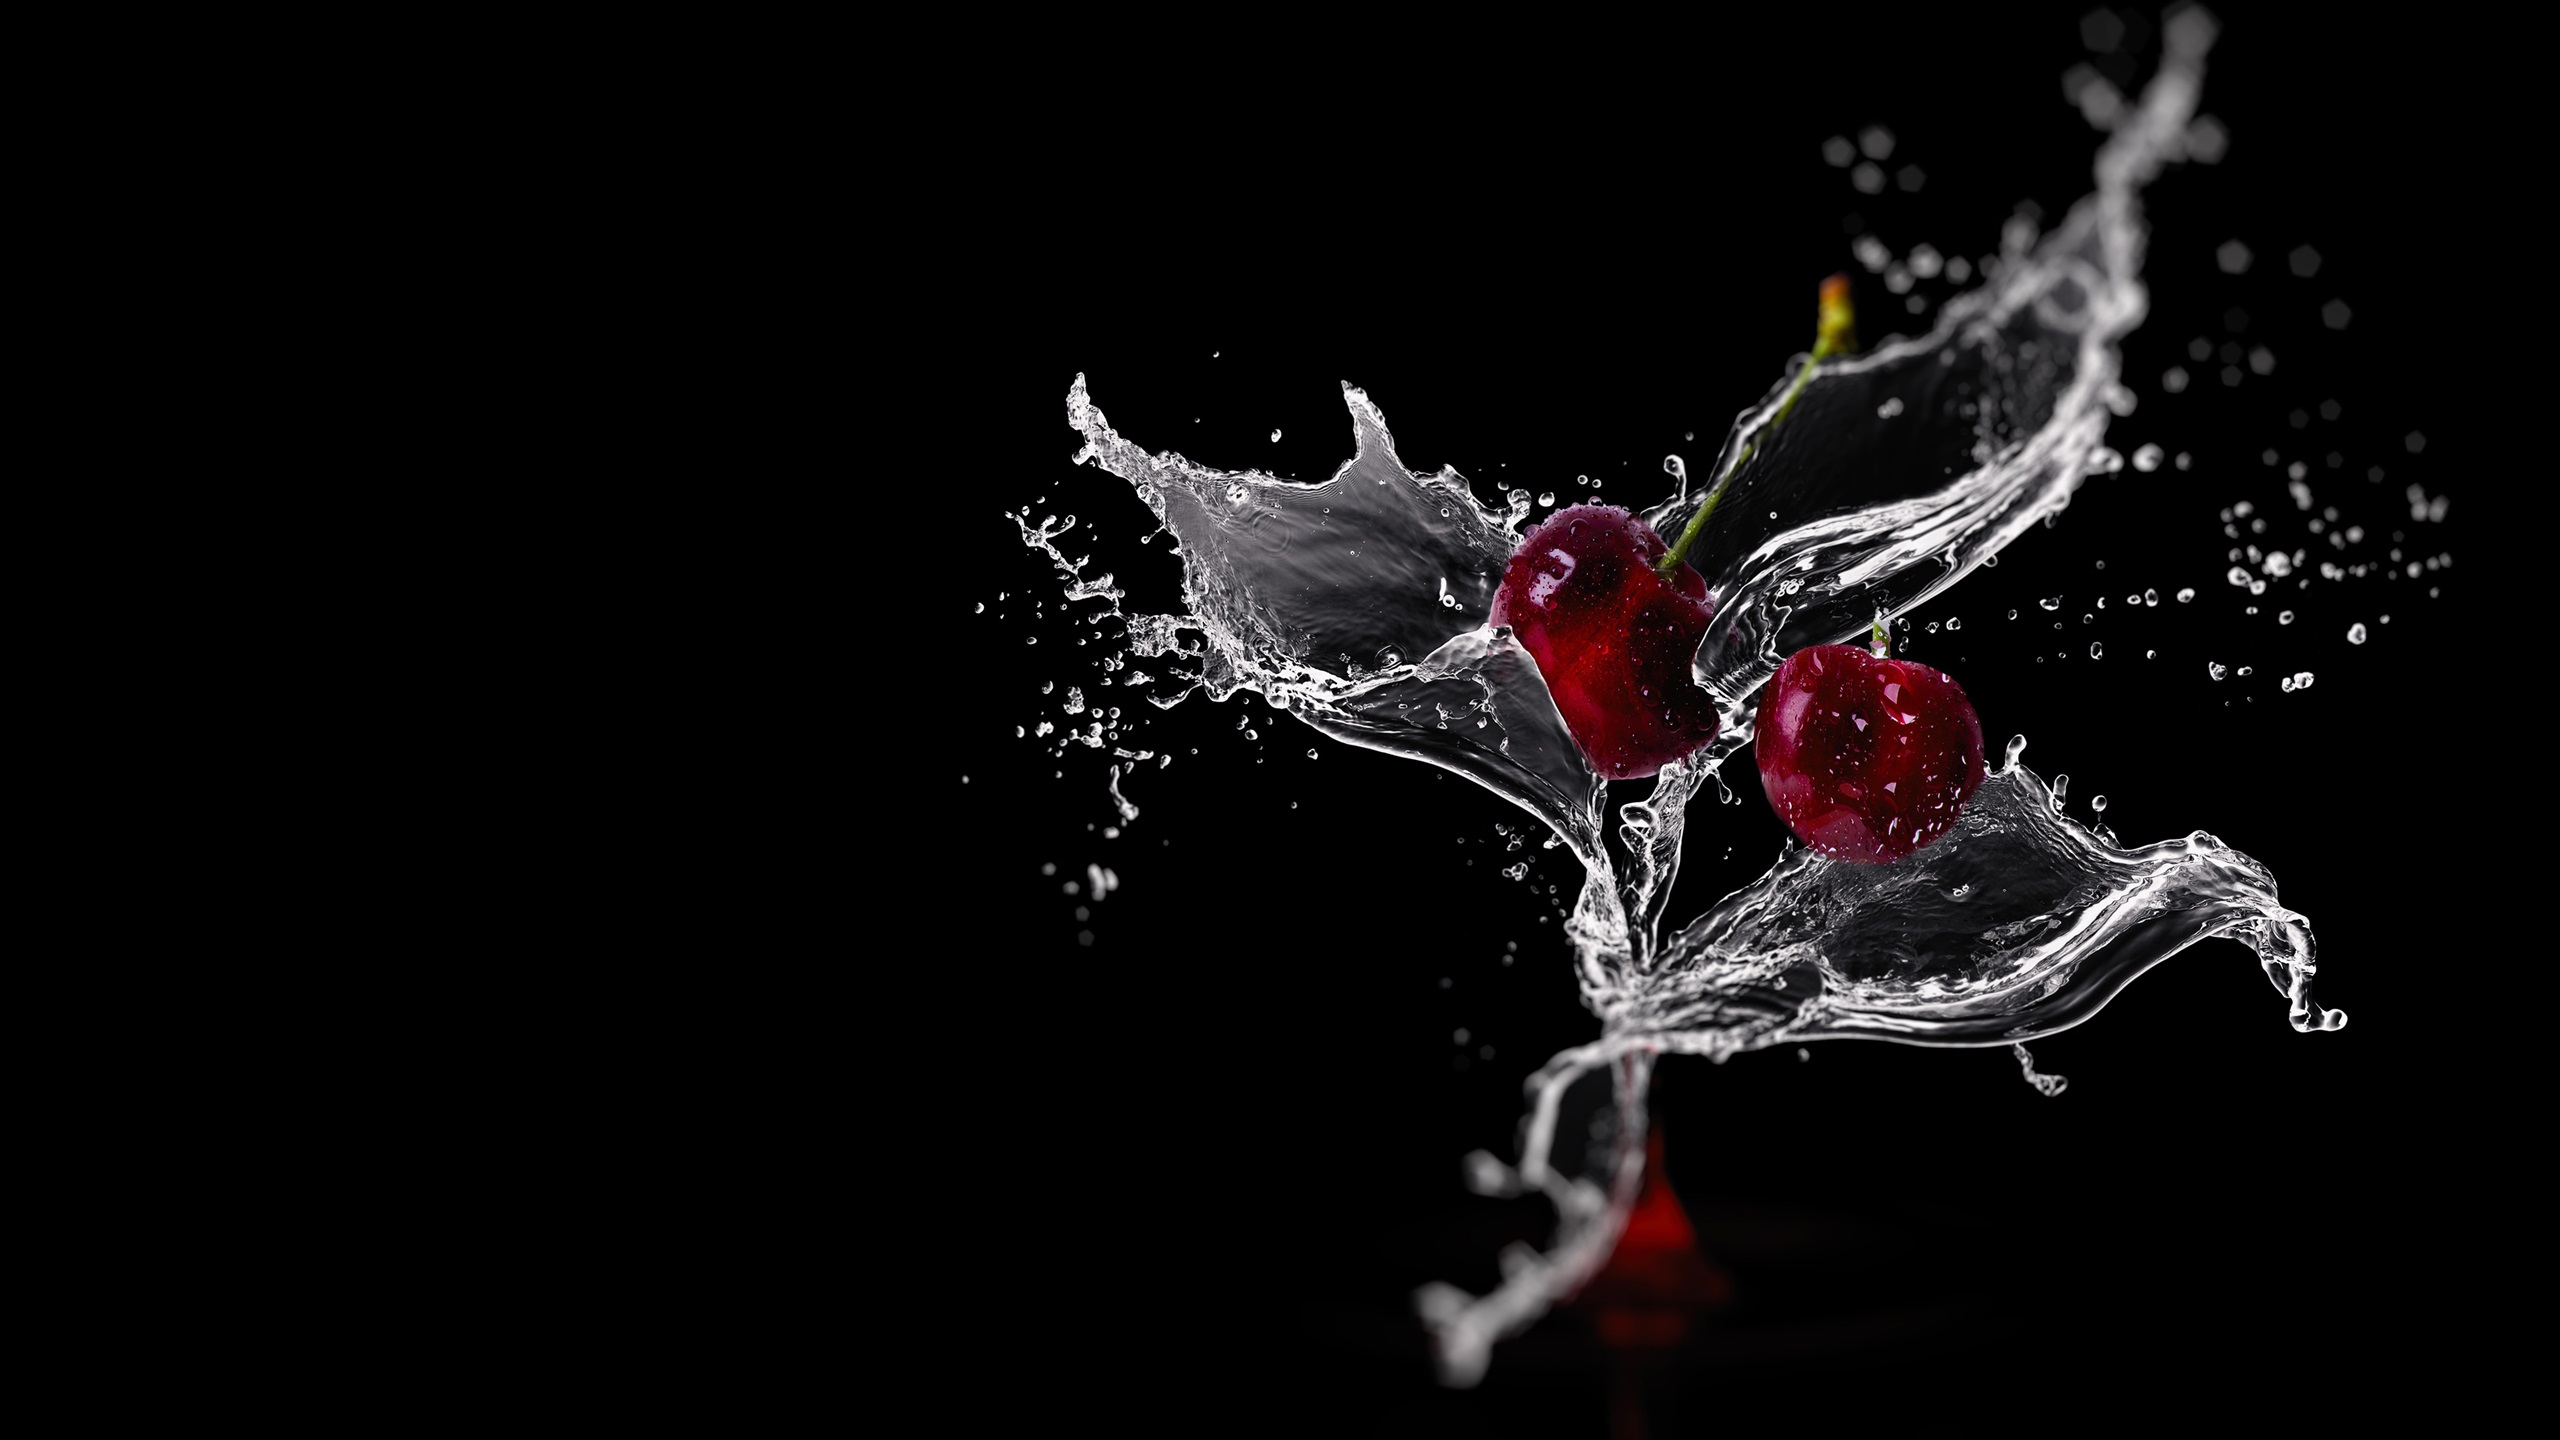 Cherry Splash Water Black Background 1080x1920 Iphone 876